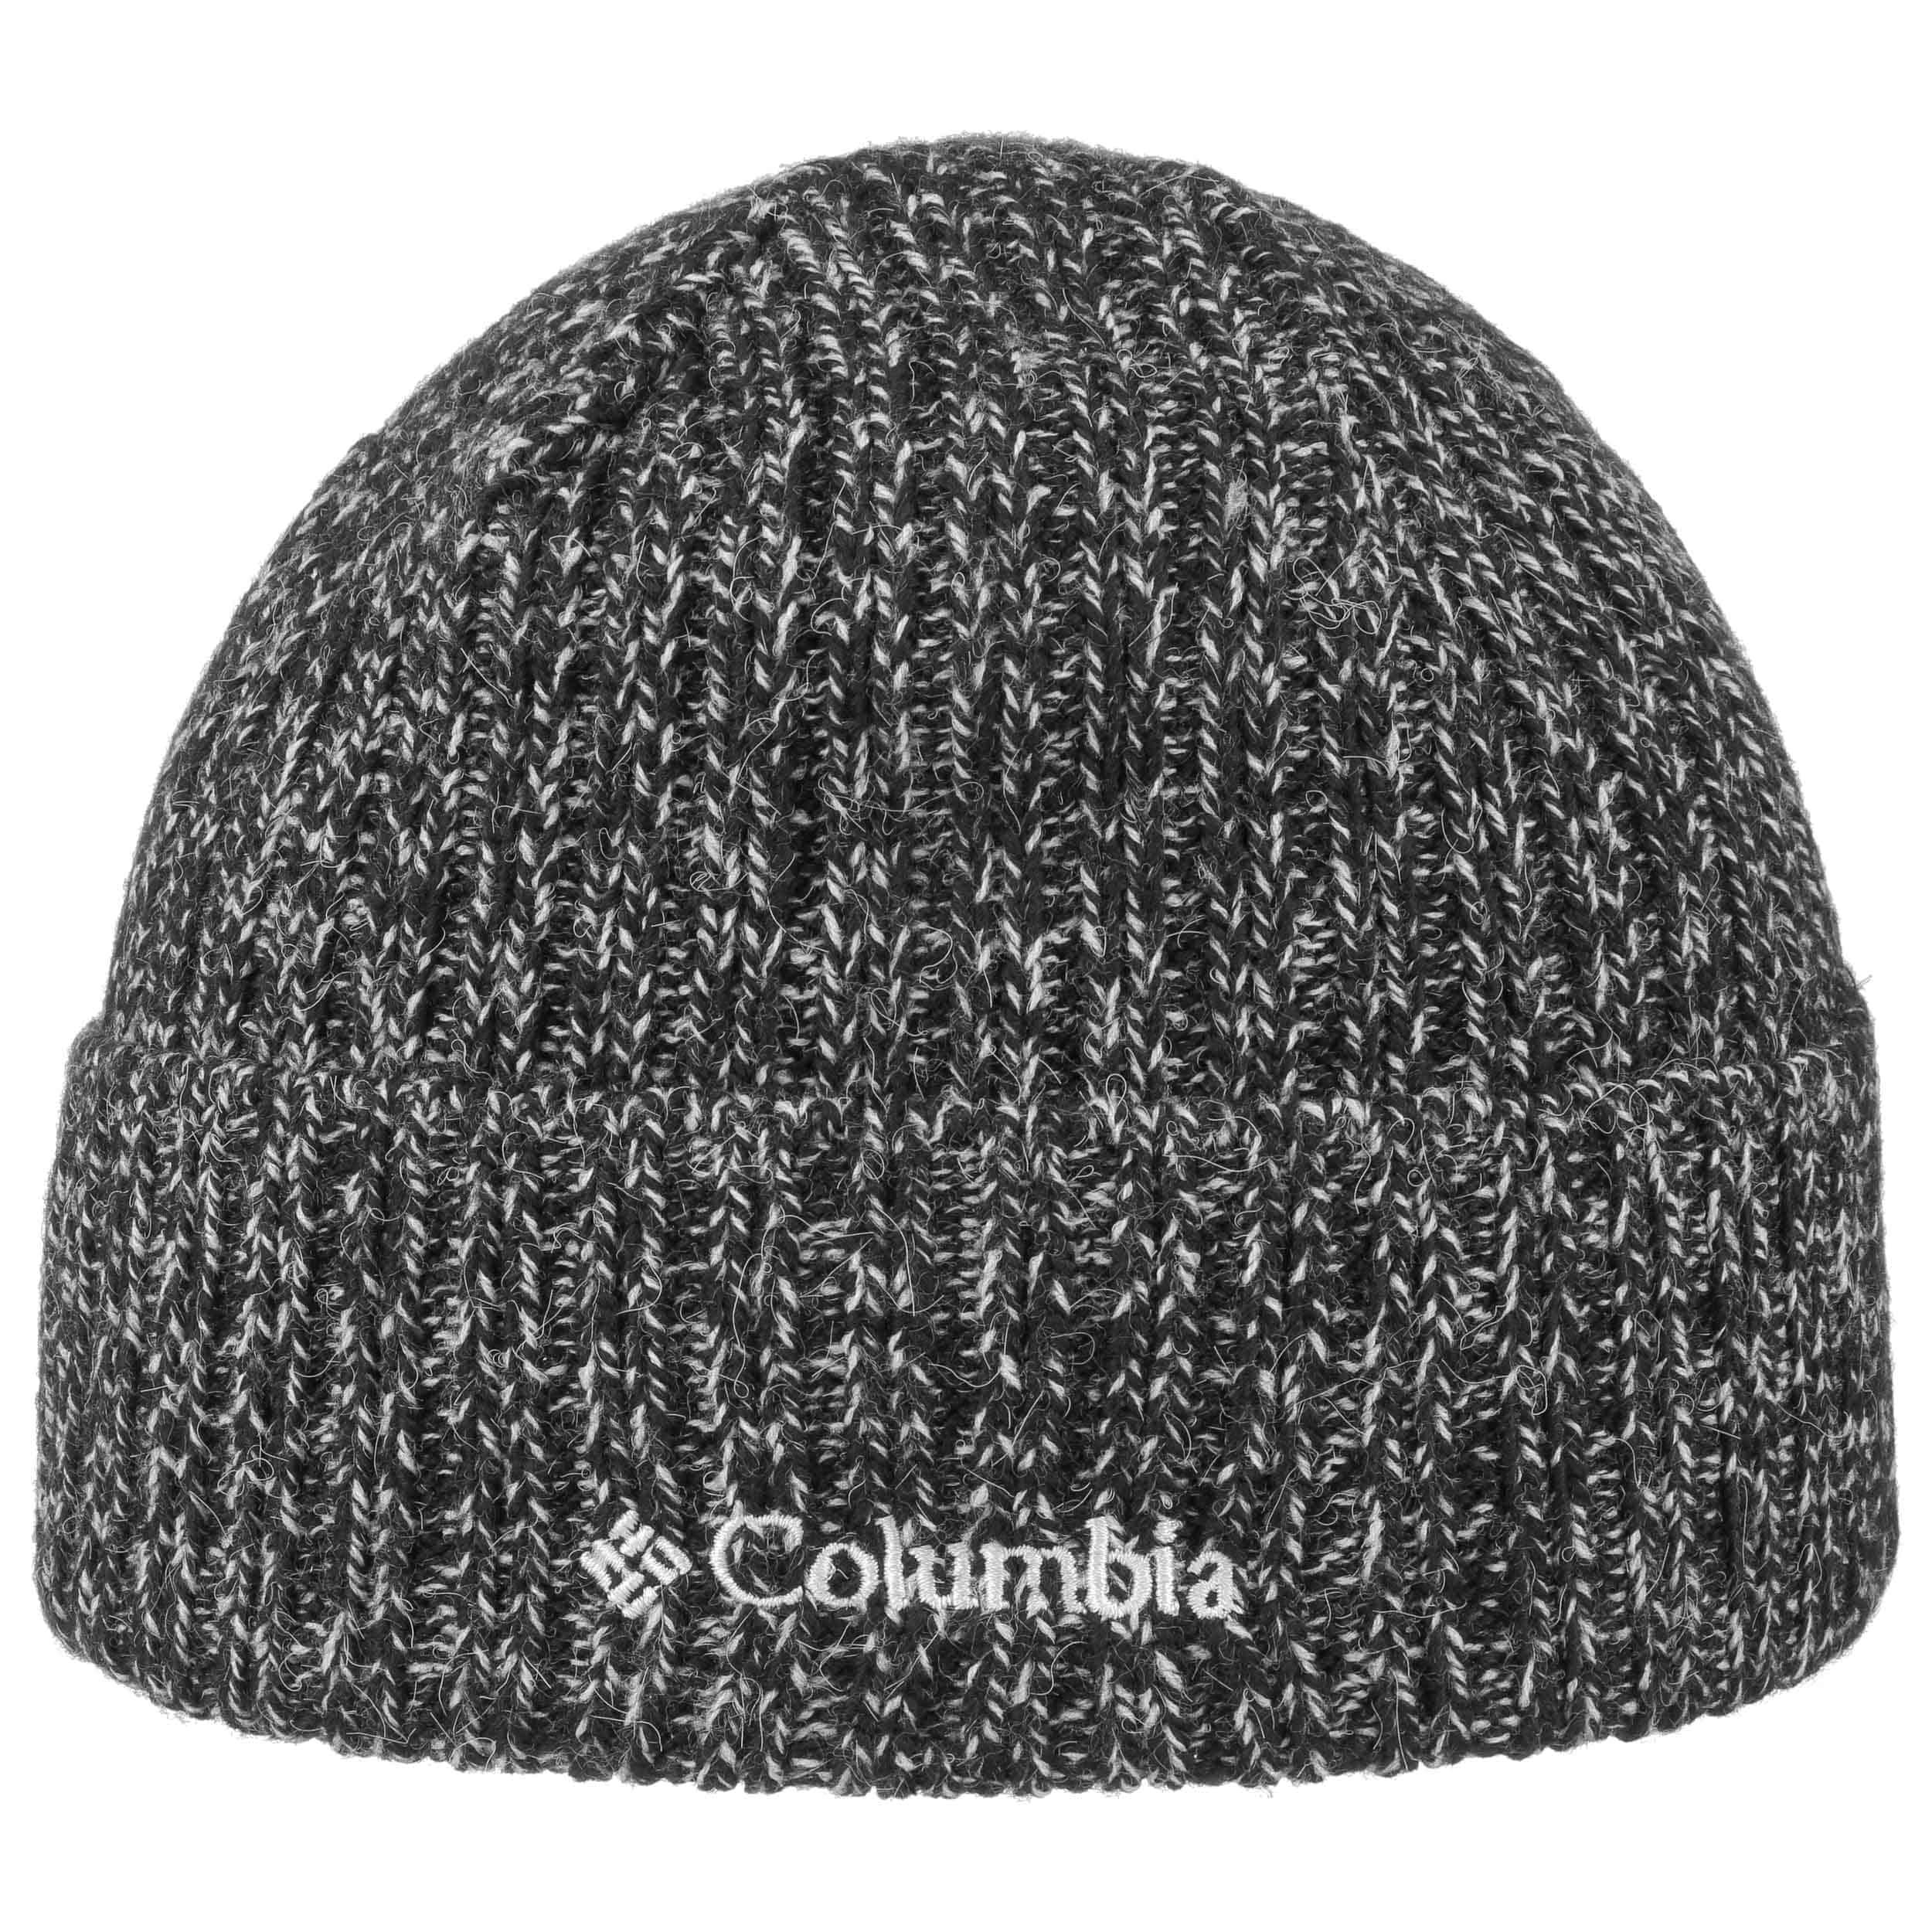 Watch Cap II Beanie by Columbia, EUR 15,95 --> Hats, caps & beanies ...